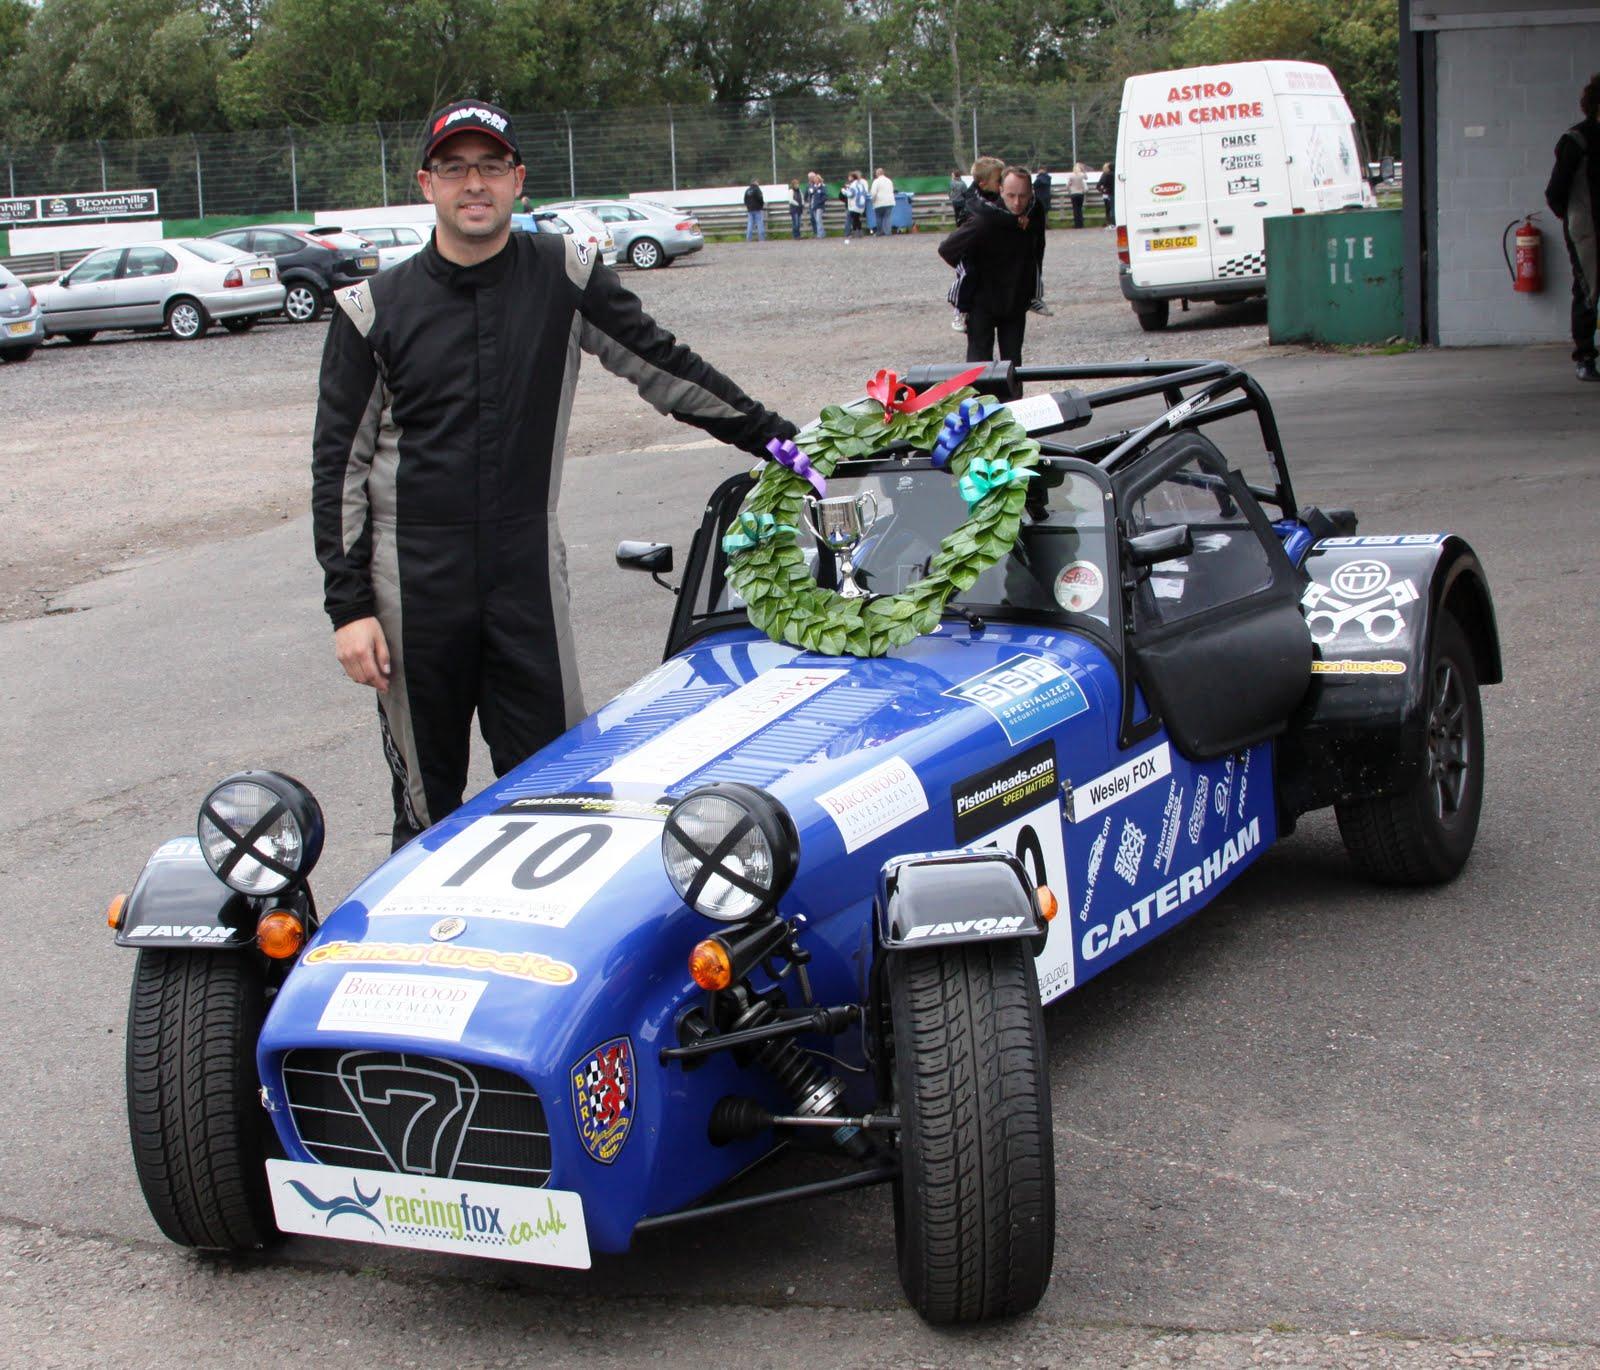 Wesley Fox Caterham Academy And Roadsport Champion